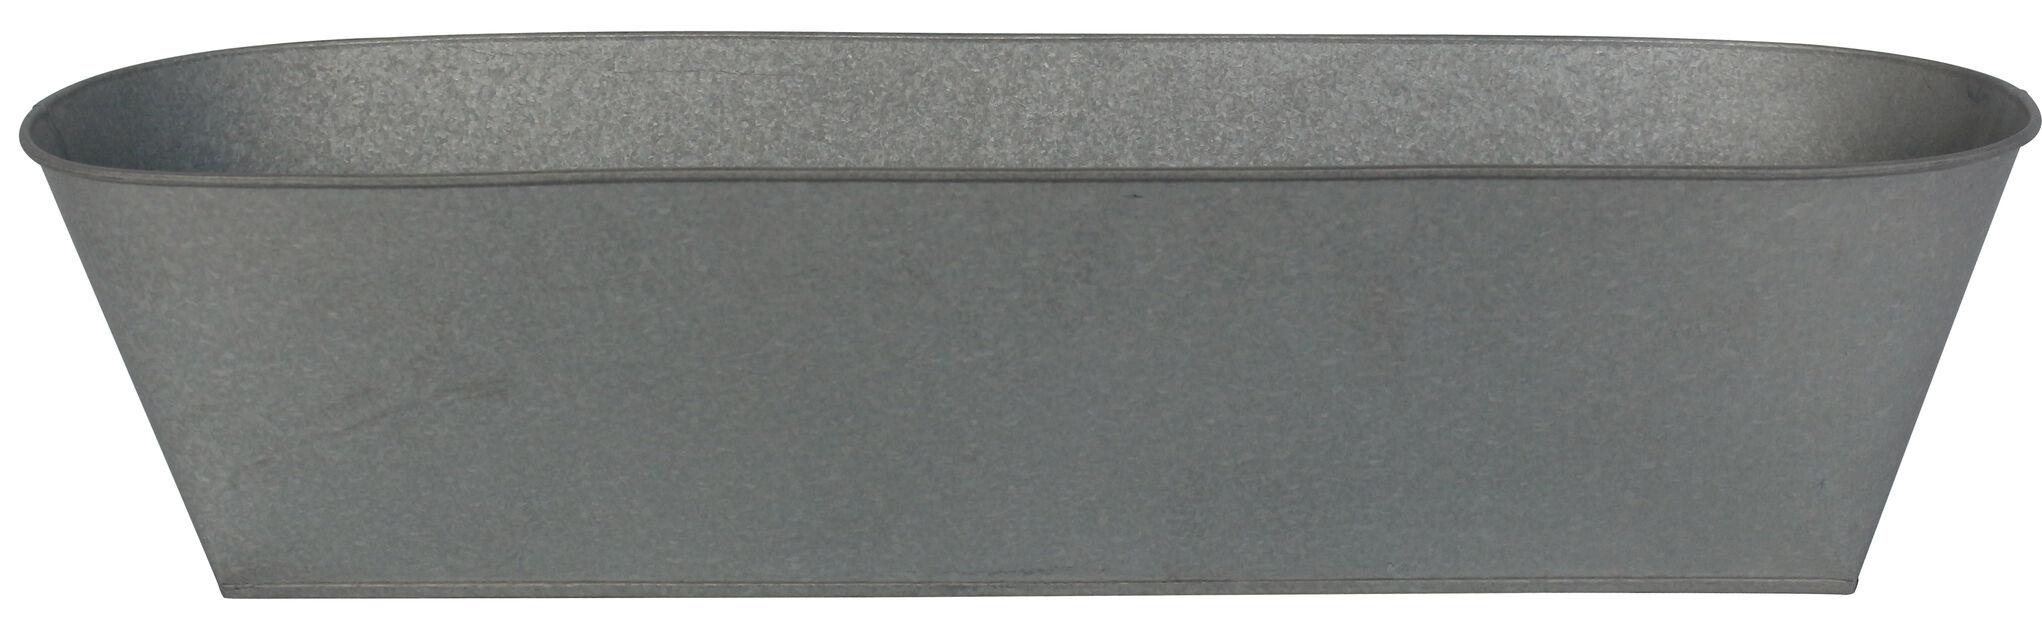 Parvekelaatikko Mario, Sinkki 61,5 cm